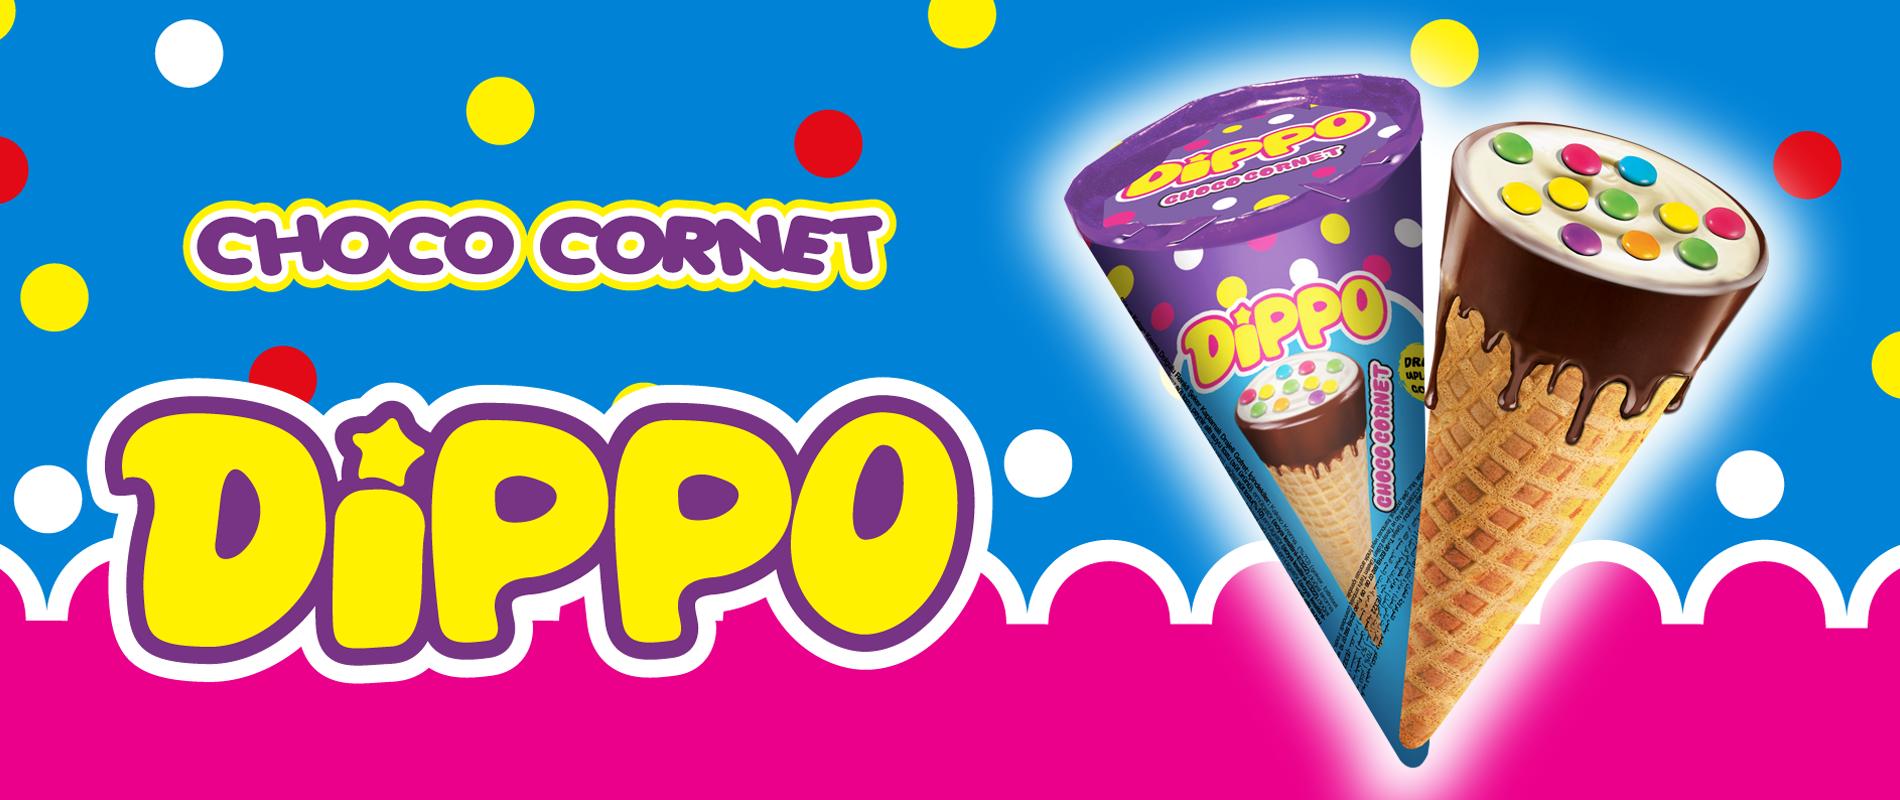 Dippo Cornet Choco 2